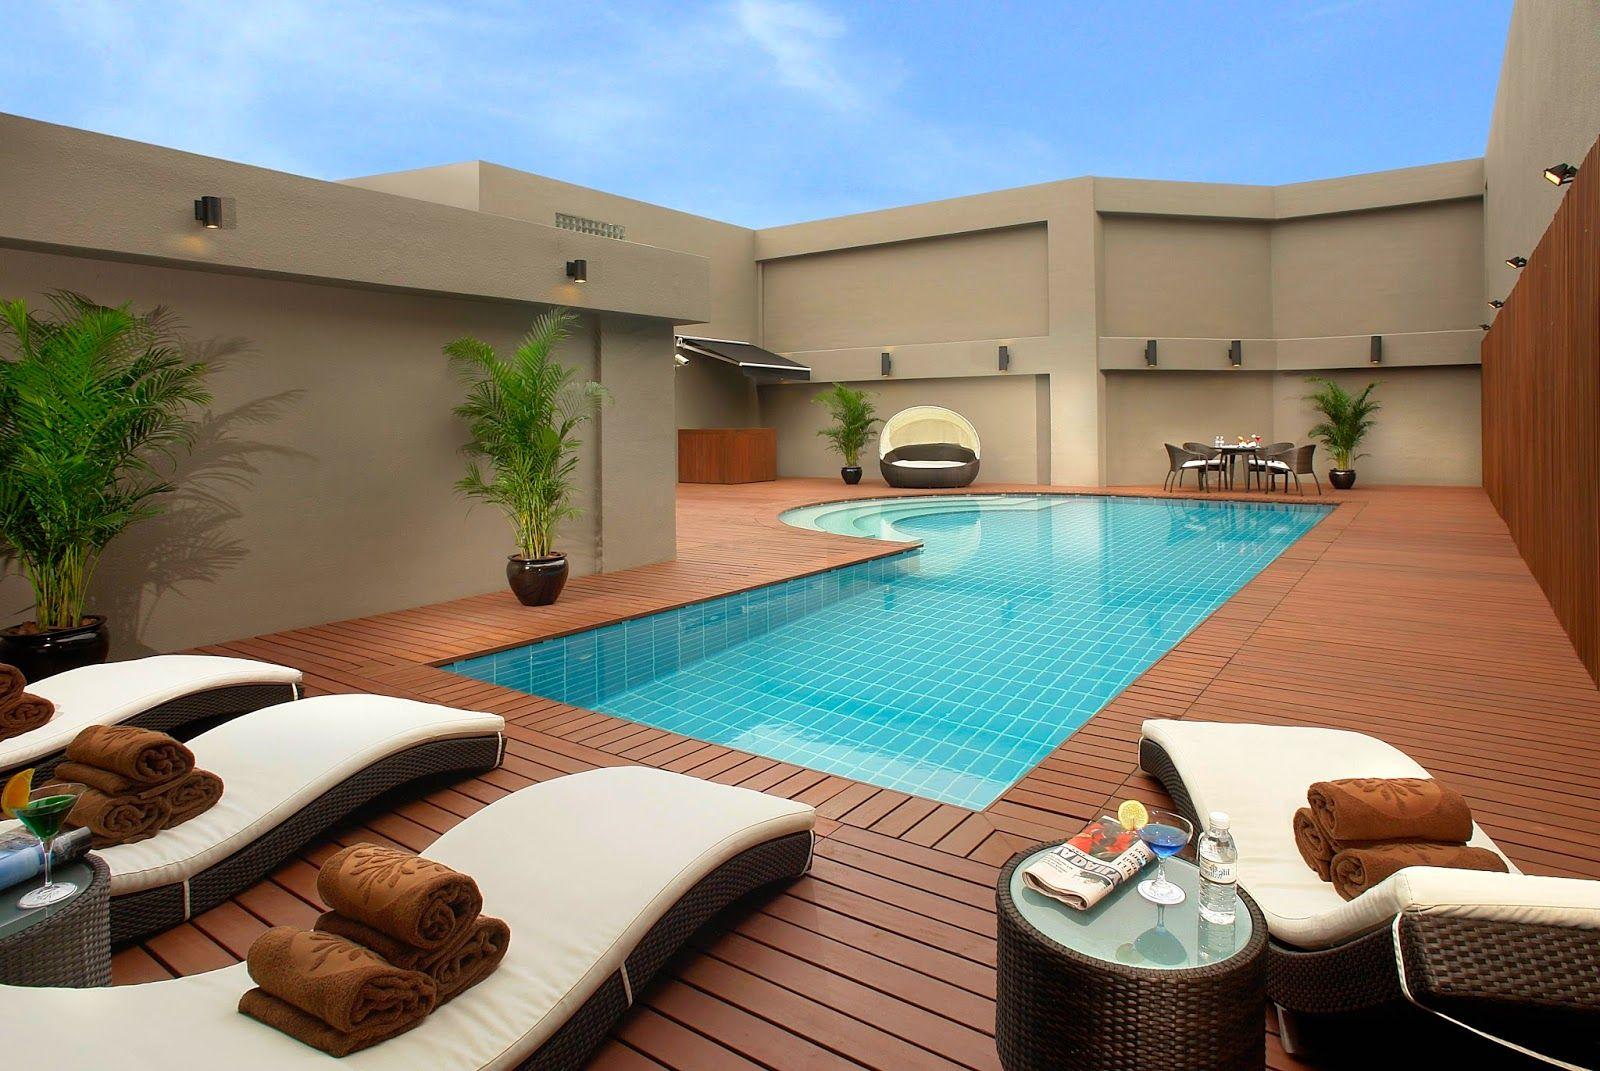 M s de 25 ideas incre bles sobre piscinas enterradas en - Piscinas desmontables enterradas ...